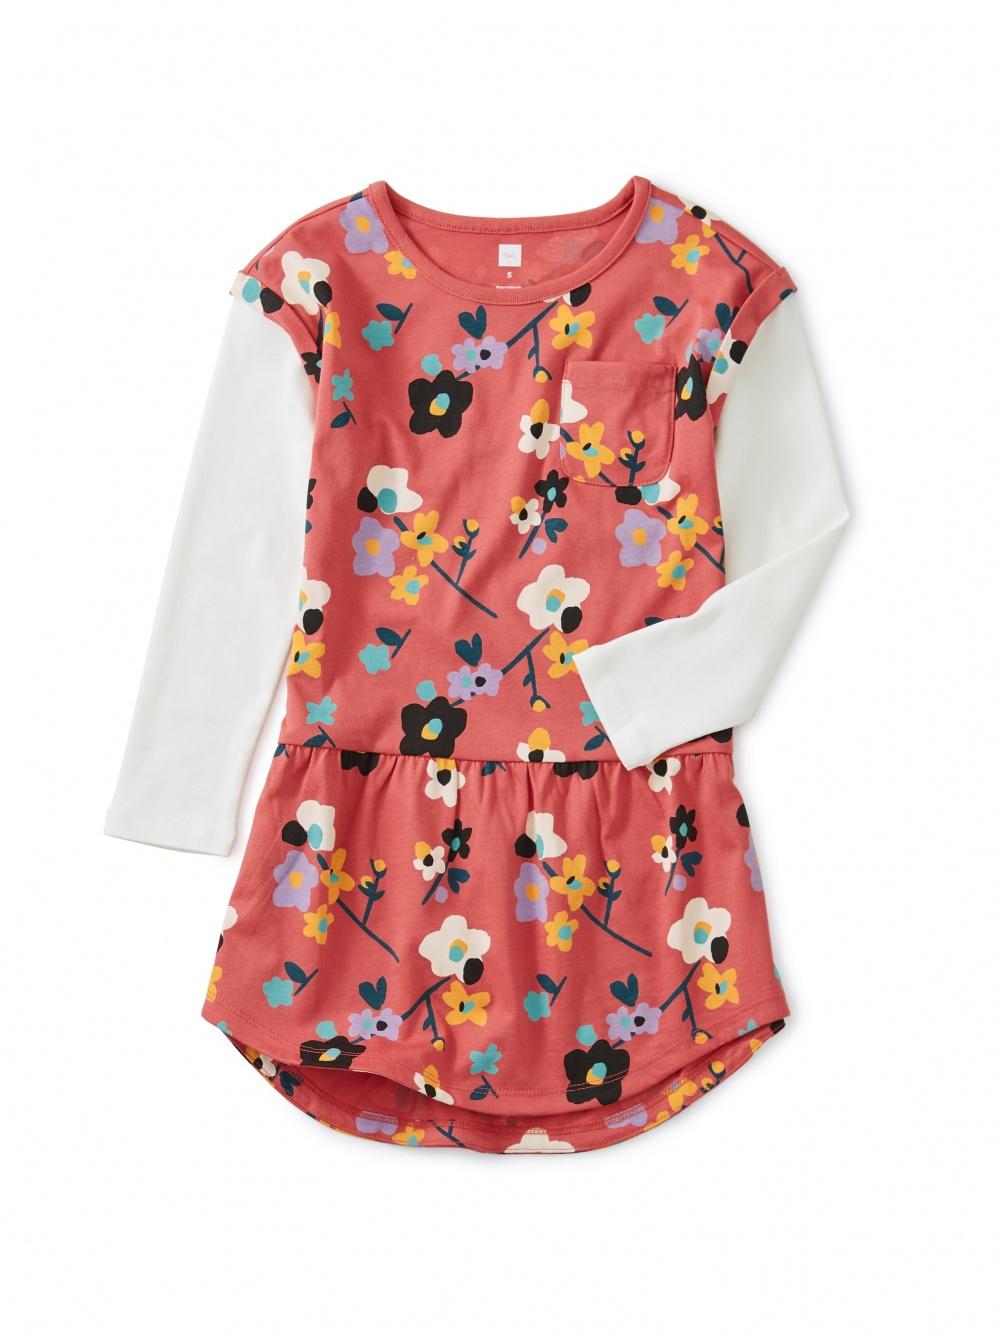 Printed Layered Sleeve Pocket Dress